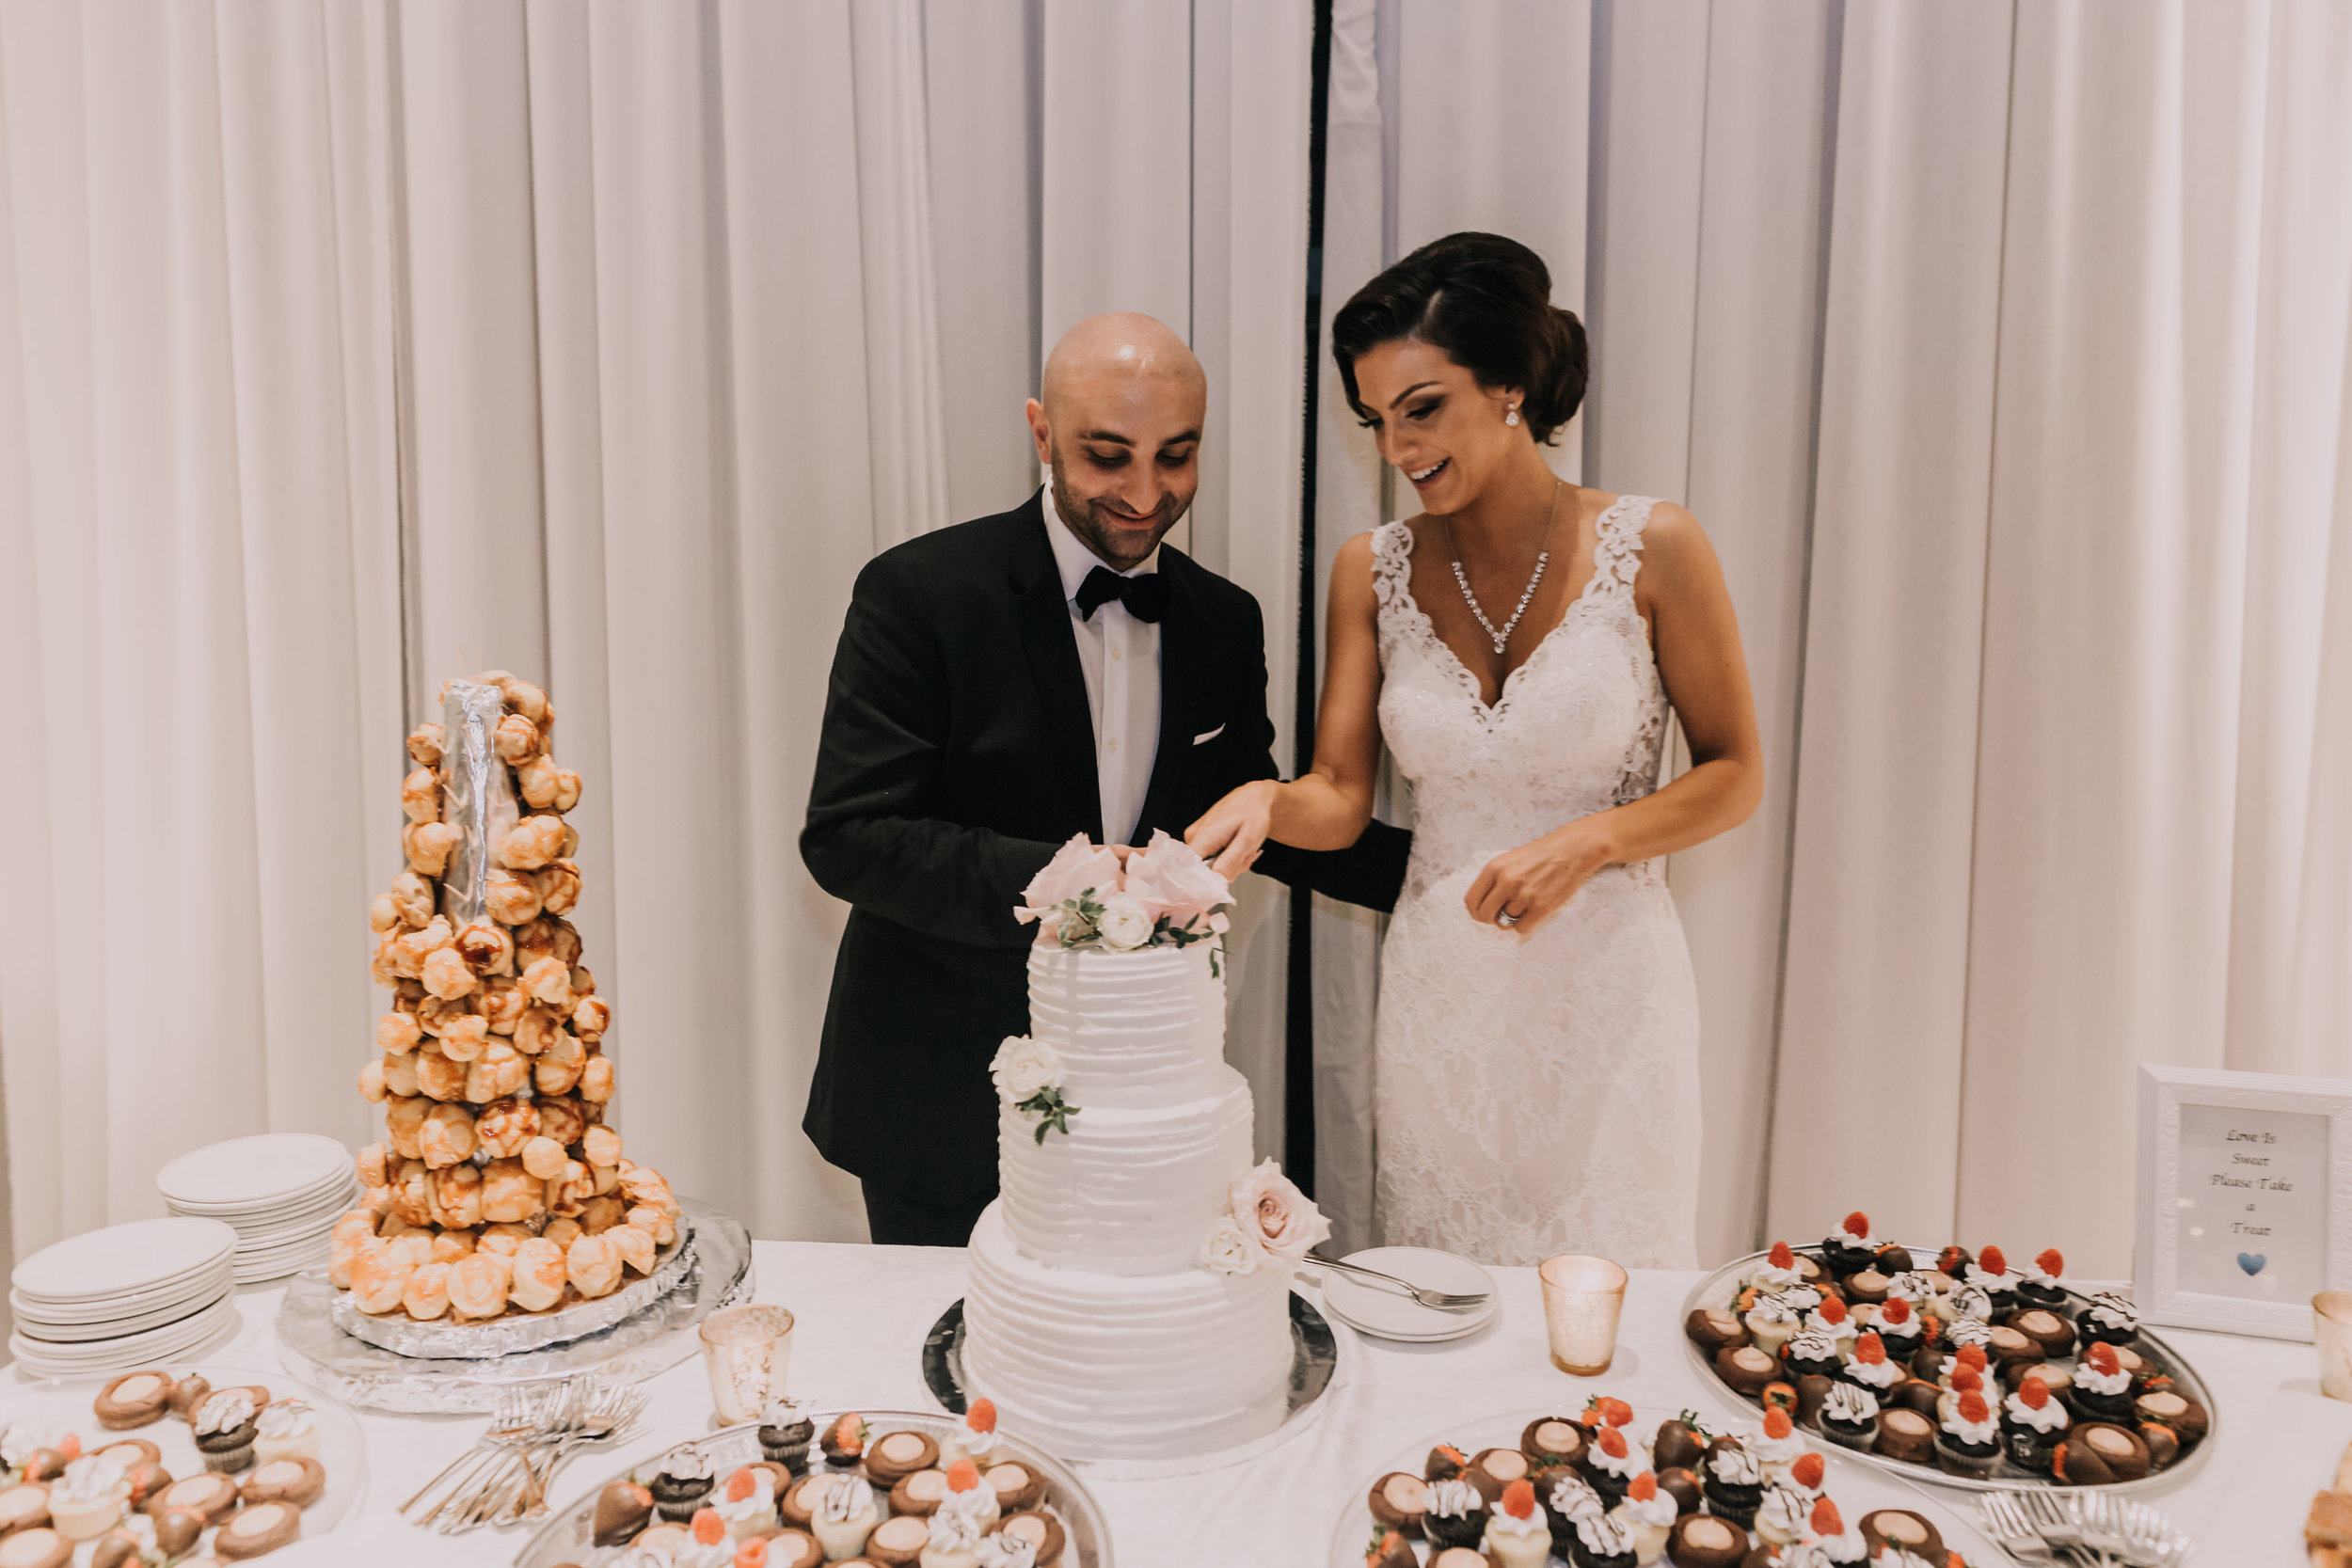 Pitt Meadows Wedding Photographer - Sky Hangar Wedding Photos - Vancouver Wedding Photographer & Videographer - Sunshine Coast Wedding Photos - Sunshine Coast Wedding Photographer - Jennifer Picard Photography - IMG_6523.jpg